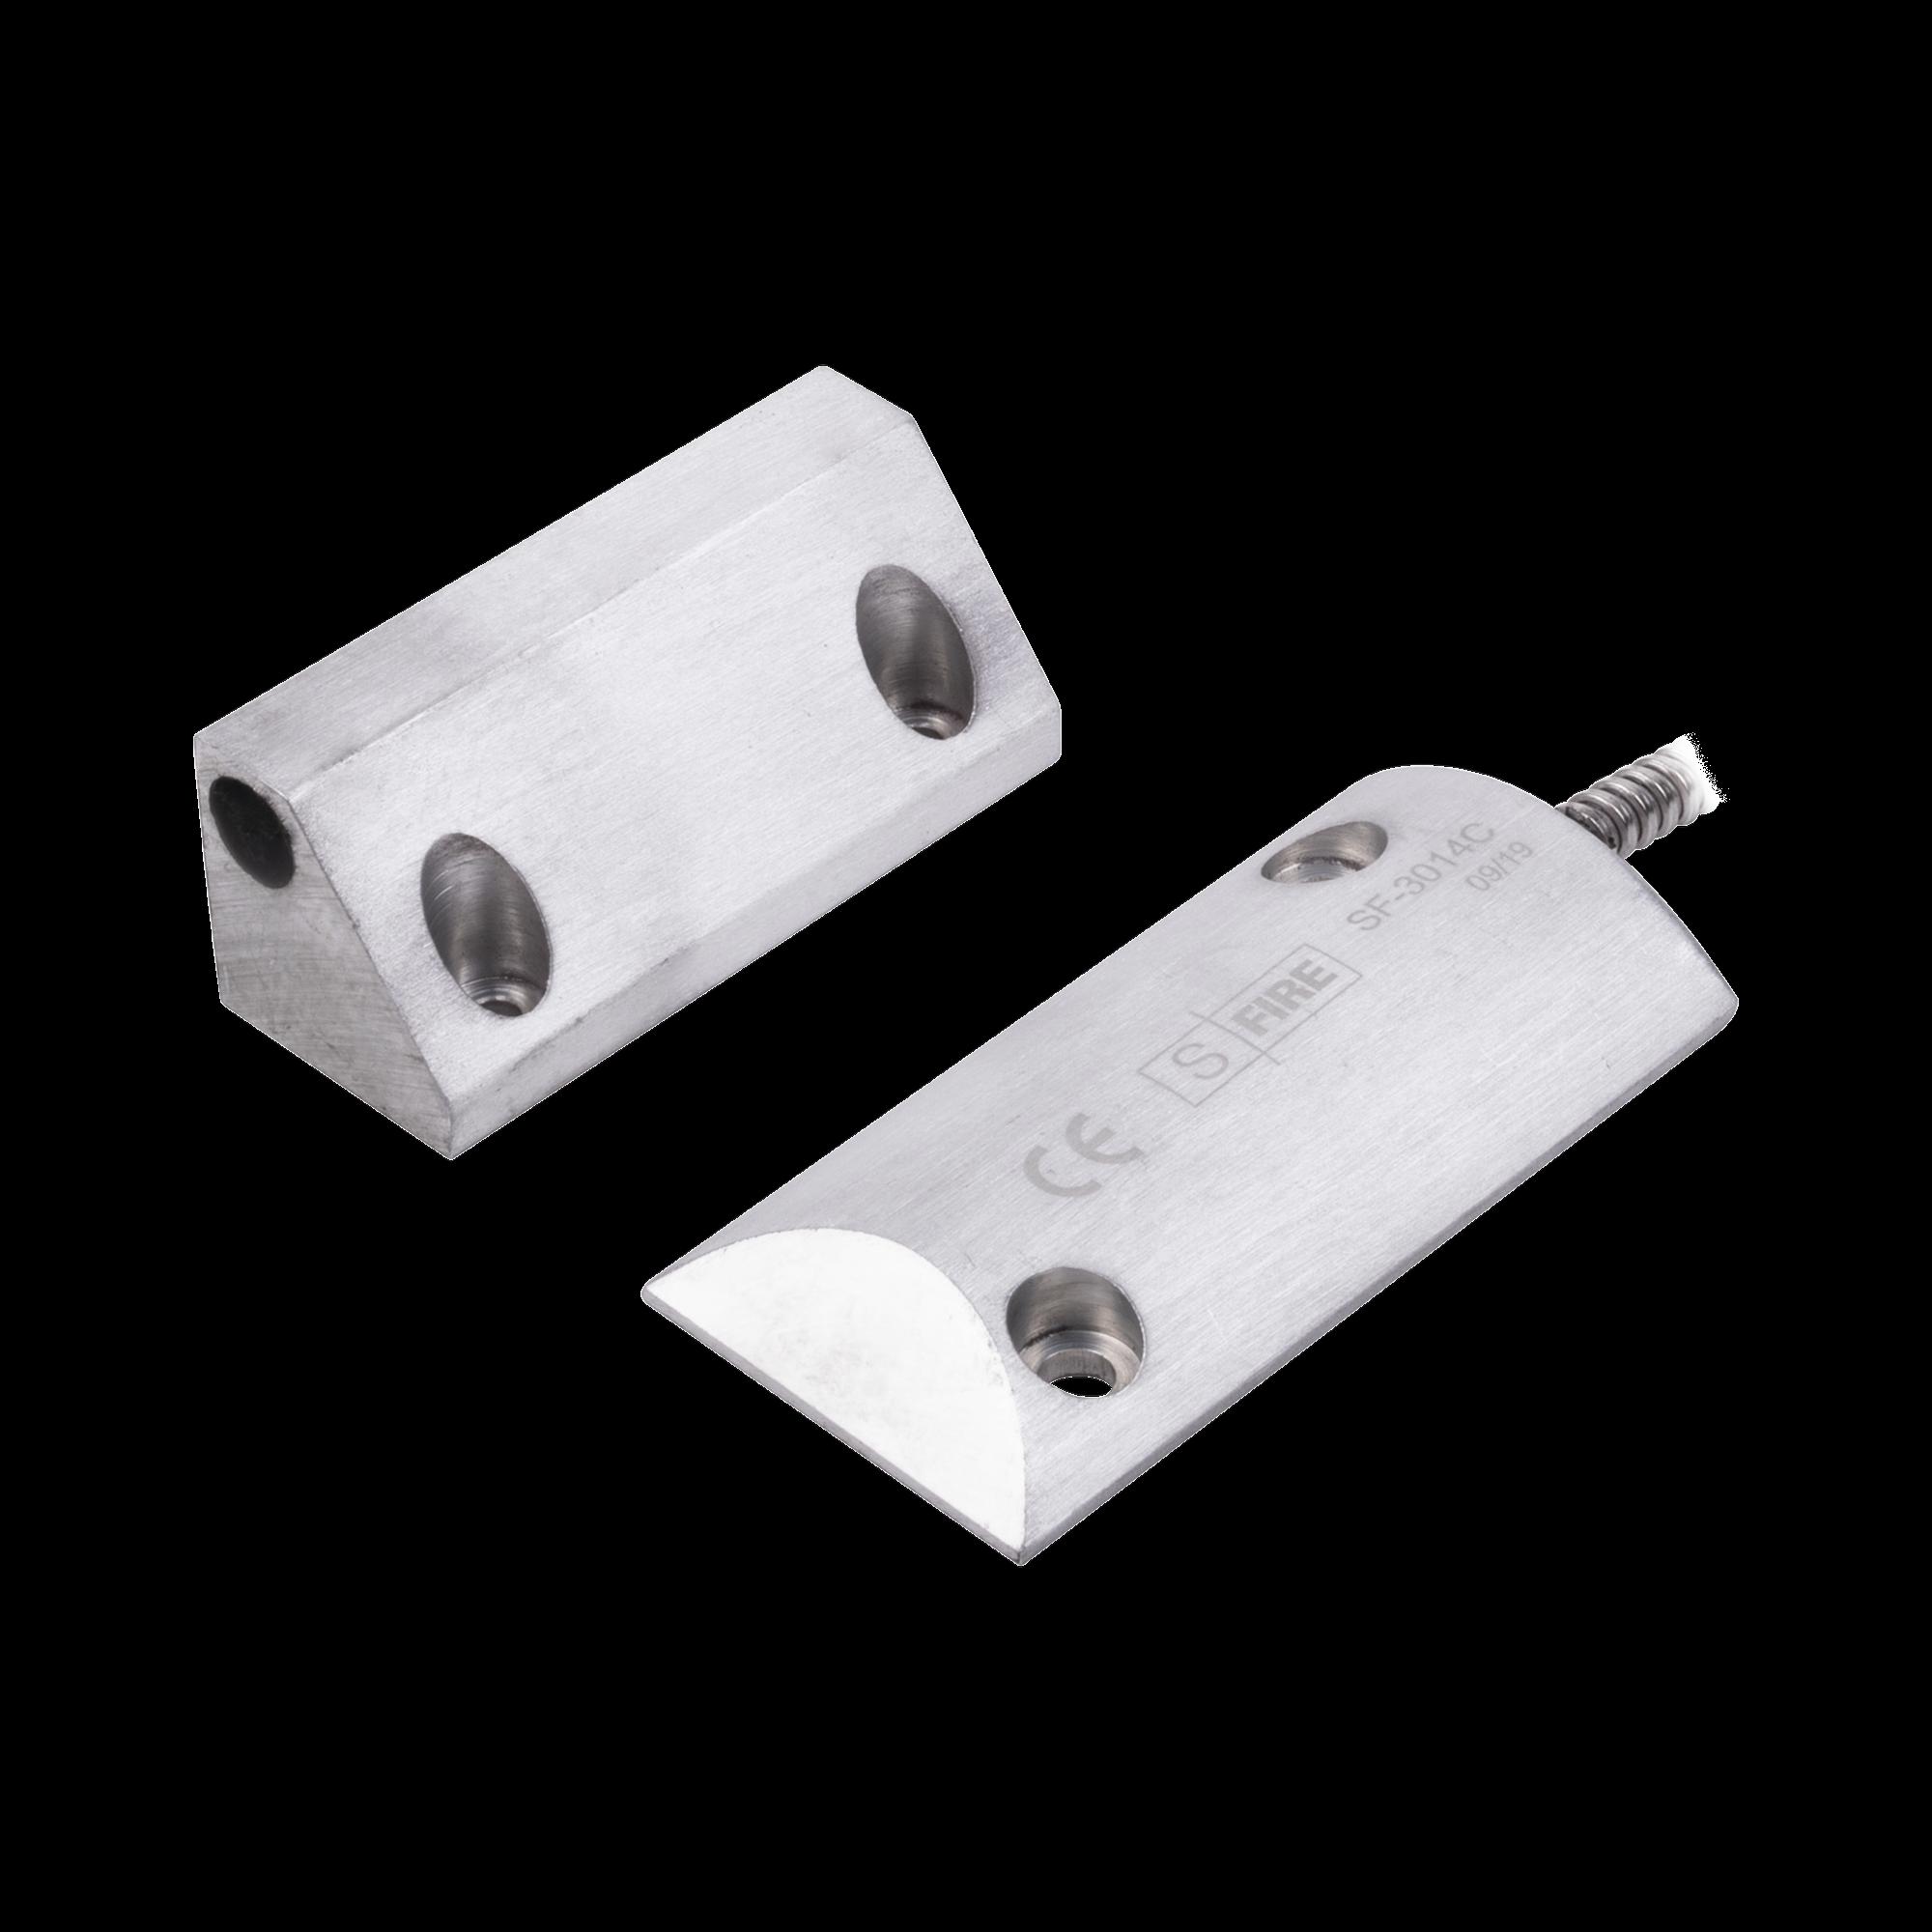 Contacto Magnético para Piso, Salida Dual NC/NA, GAP 75mm, Cubierta de Aluminio con 55cm de Cable Blindado